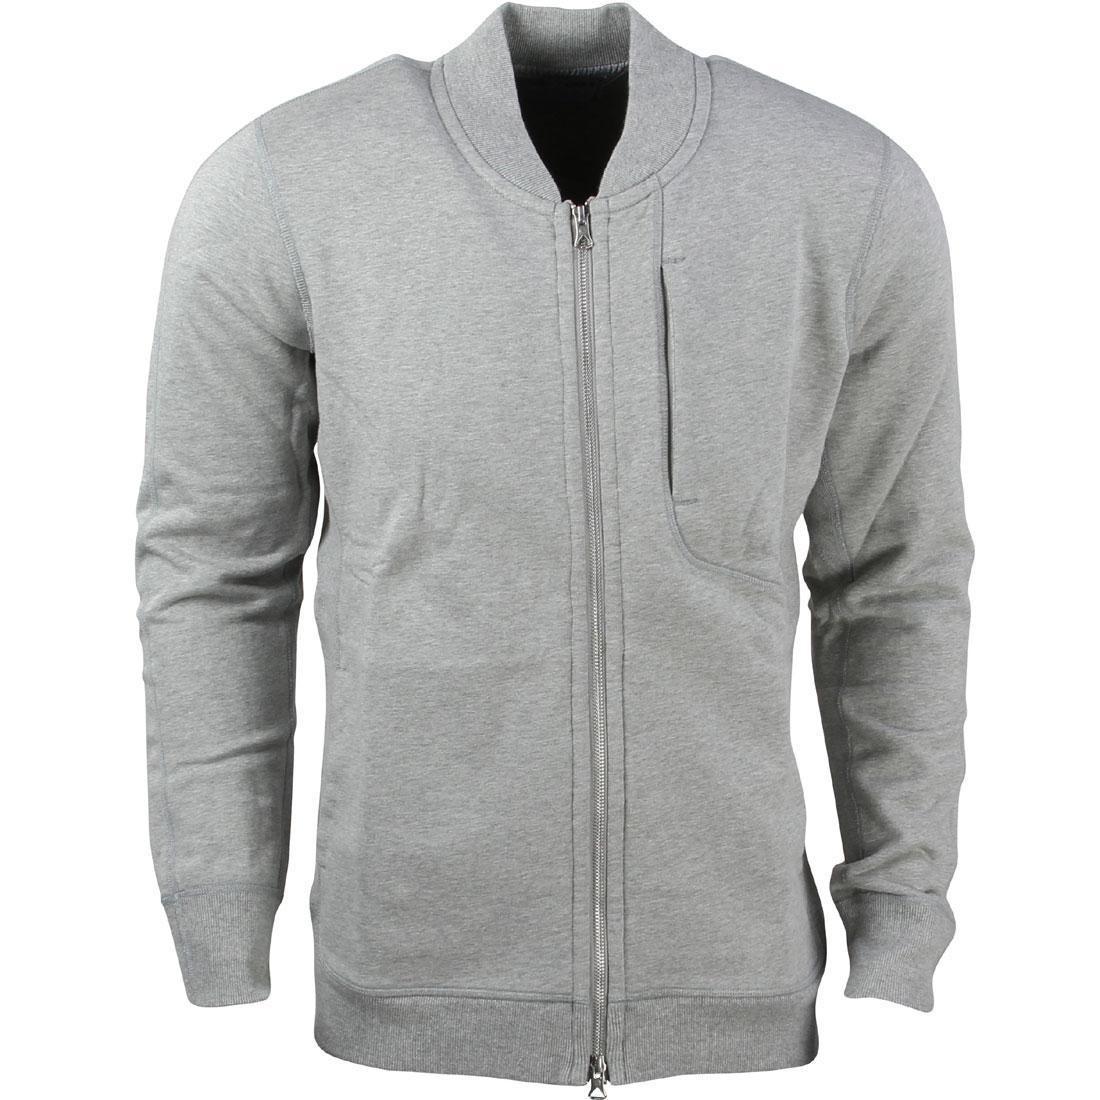 Asics Tiger x Reigning Champ Men Bomber Jacket grey heather grey 25694a68283c